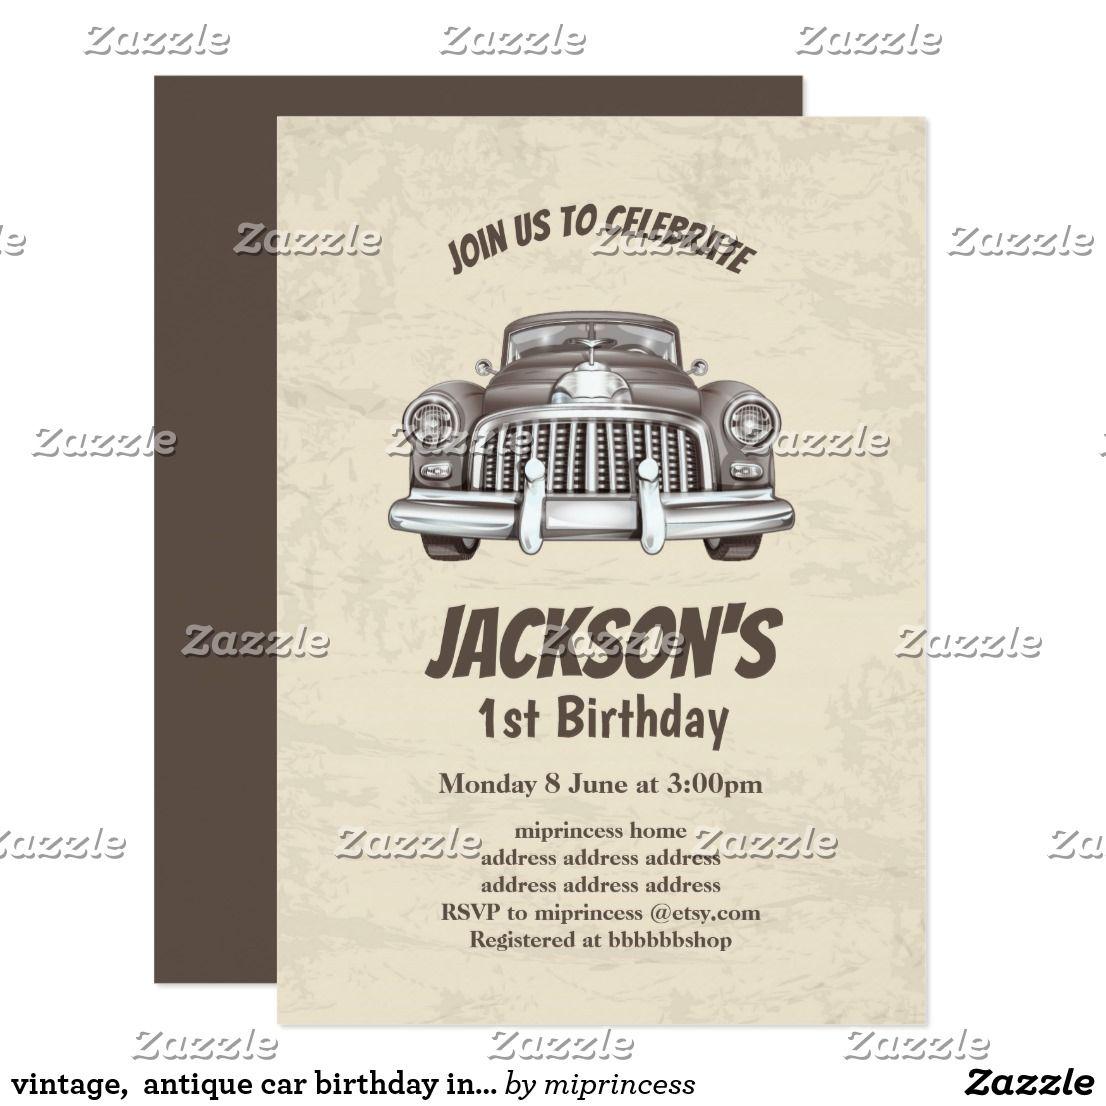 Vintage, antique car birthday invitation | invitation | Pinterest ...